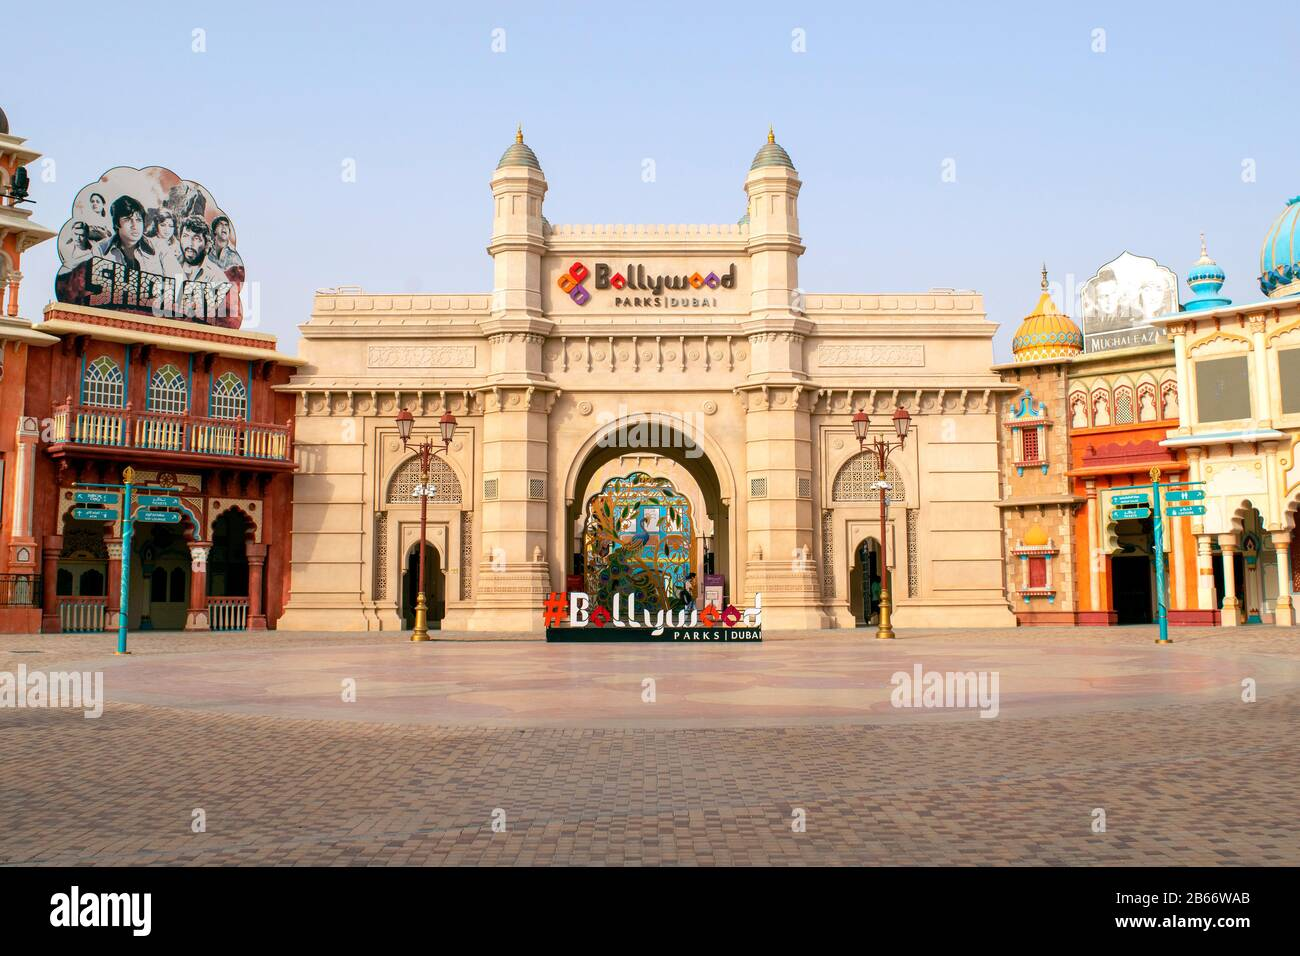 Dubai / EAU - 9 de marzo de 2020: Entrada al parque Bollywood en Dubai Parks and Resorts. Bollywood parque temático. Foto de stock